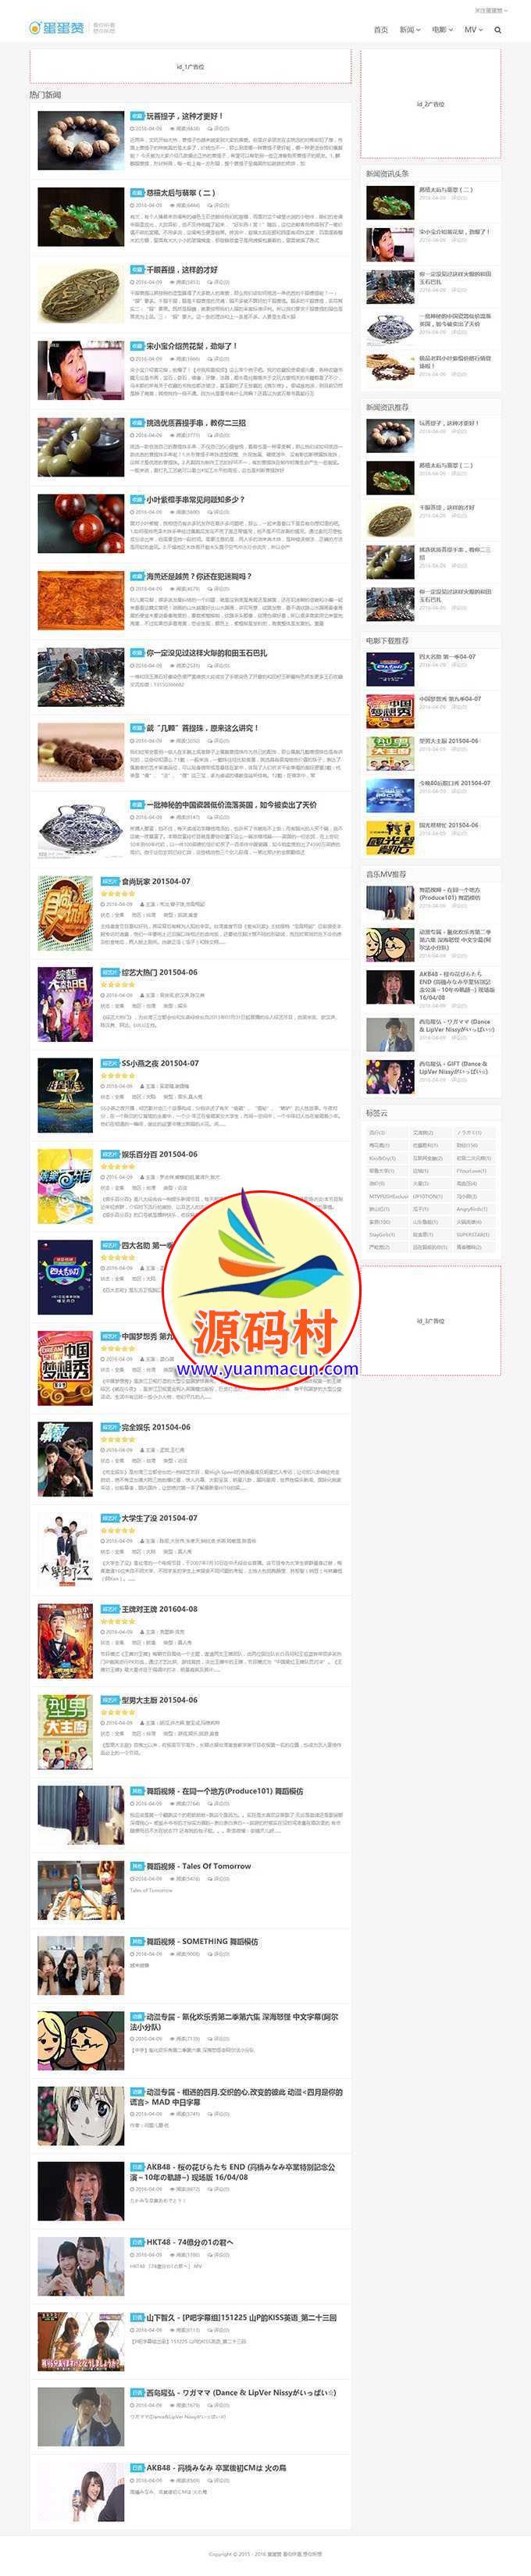 92kaifa《蛋蛋赞》全球娱乐资讯门户 帝国cms内核